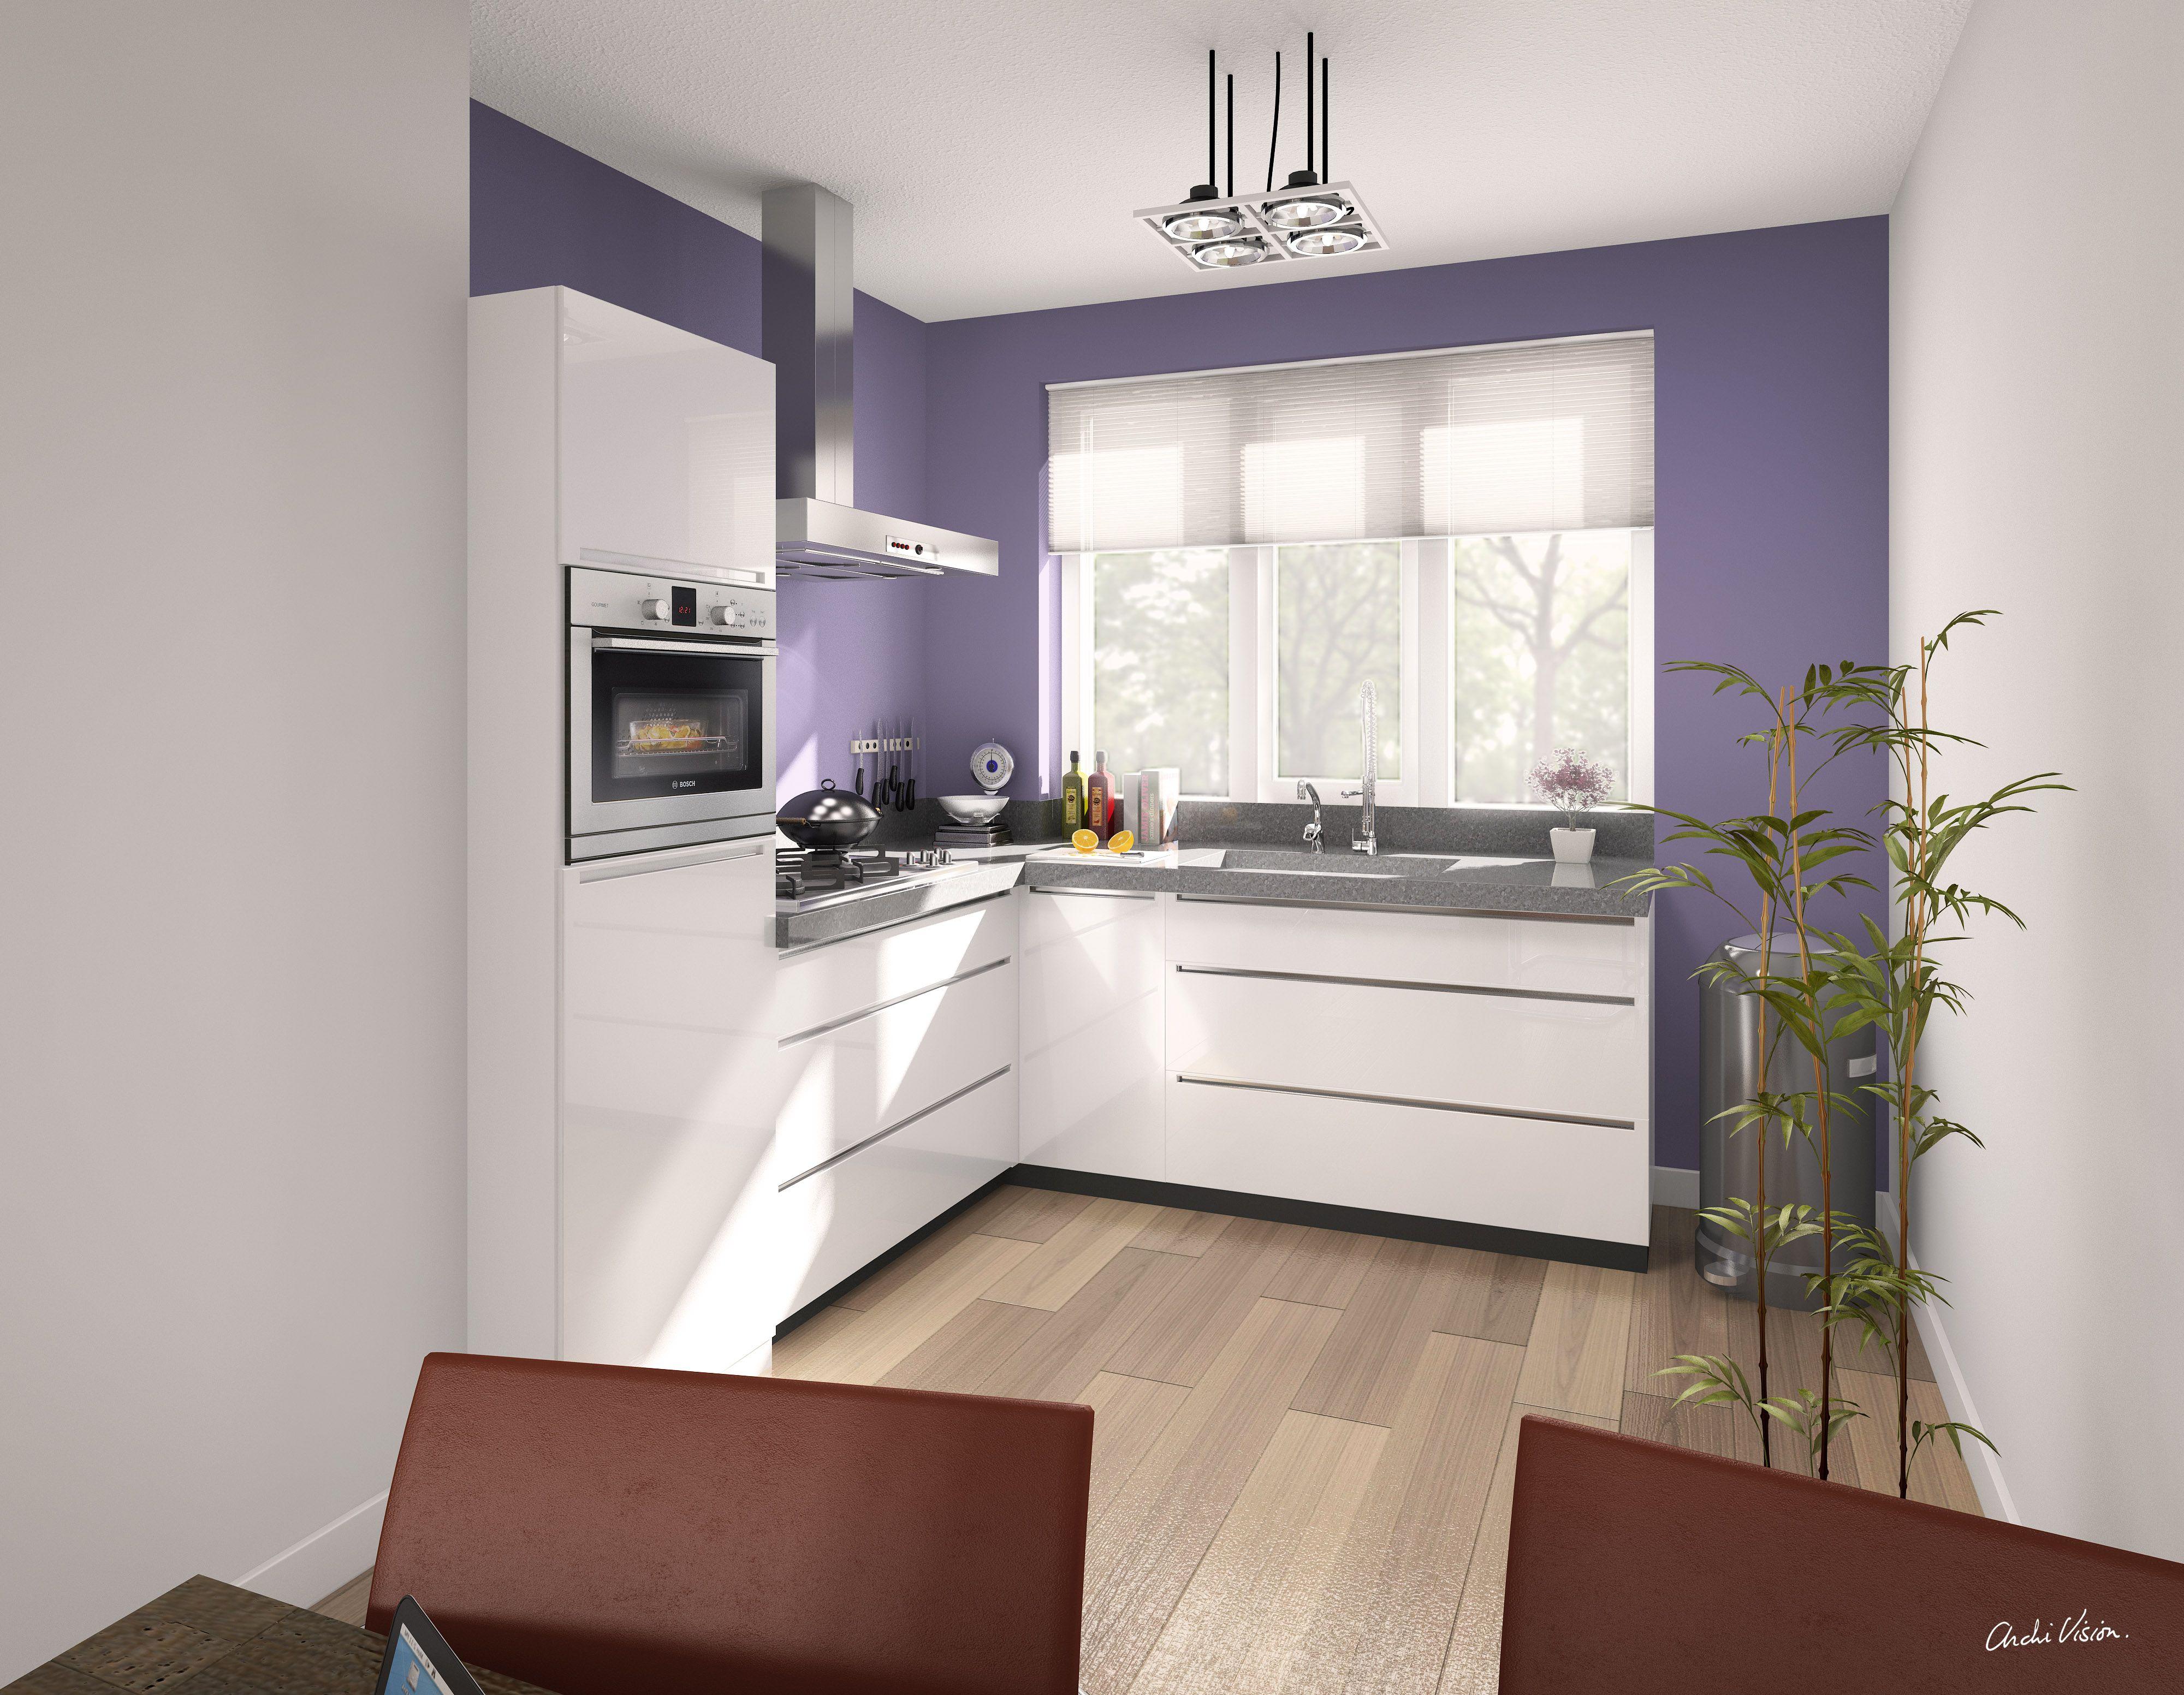 keukenontwerp hoekkeuken voor nieuwbouwwoning van wanrooij enteri r pinterest kitchens. Black Bedroom Furniture Sets. Home Design Ideas